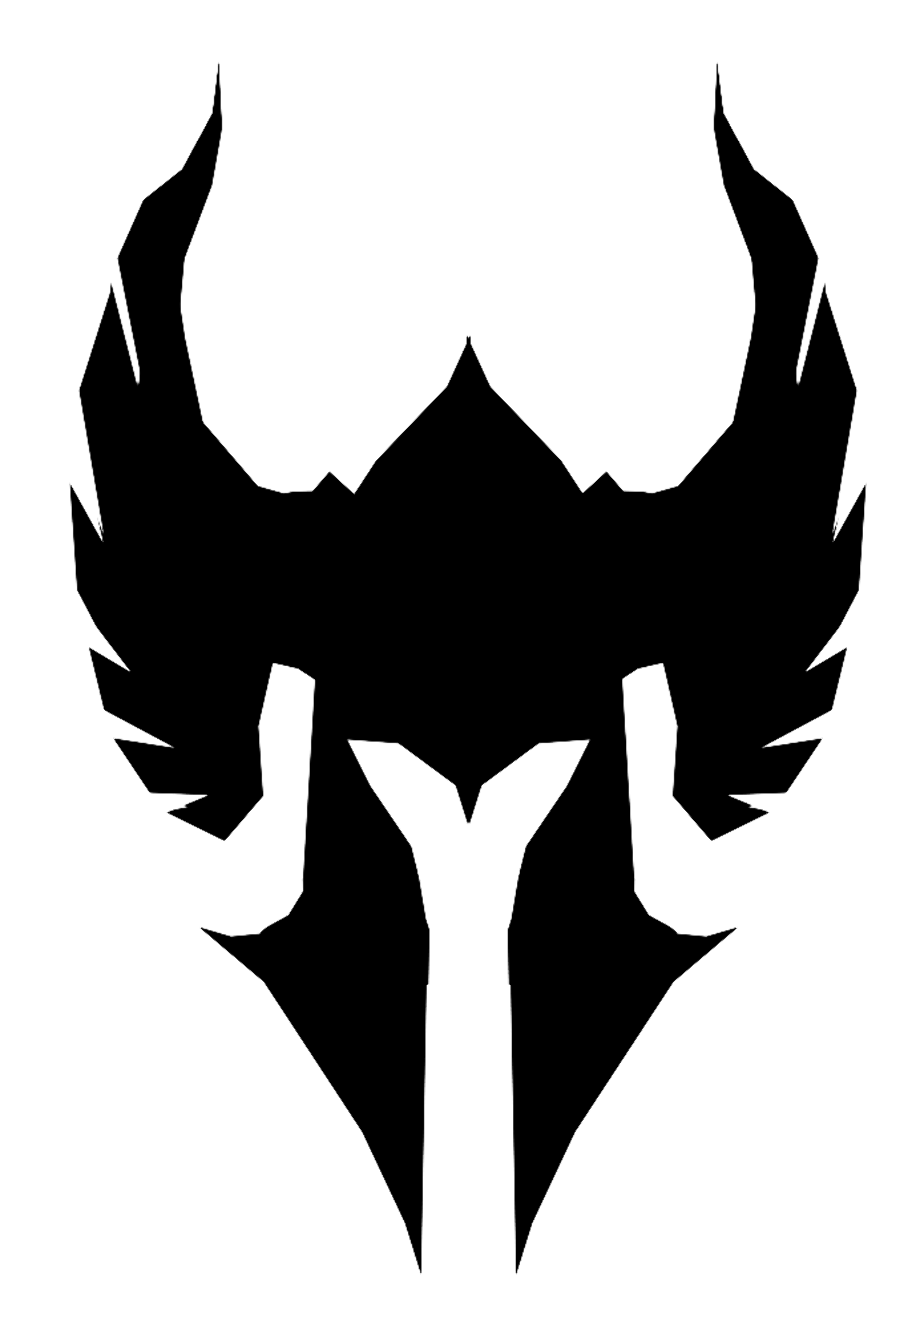 D&d logo symbol class